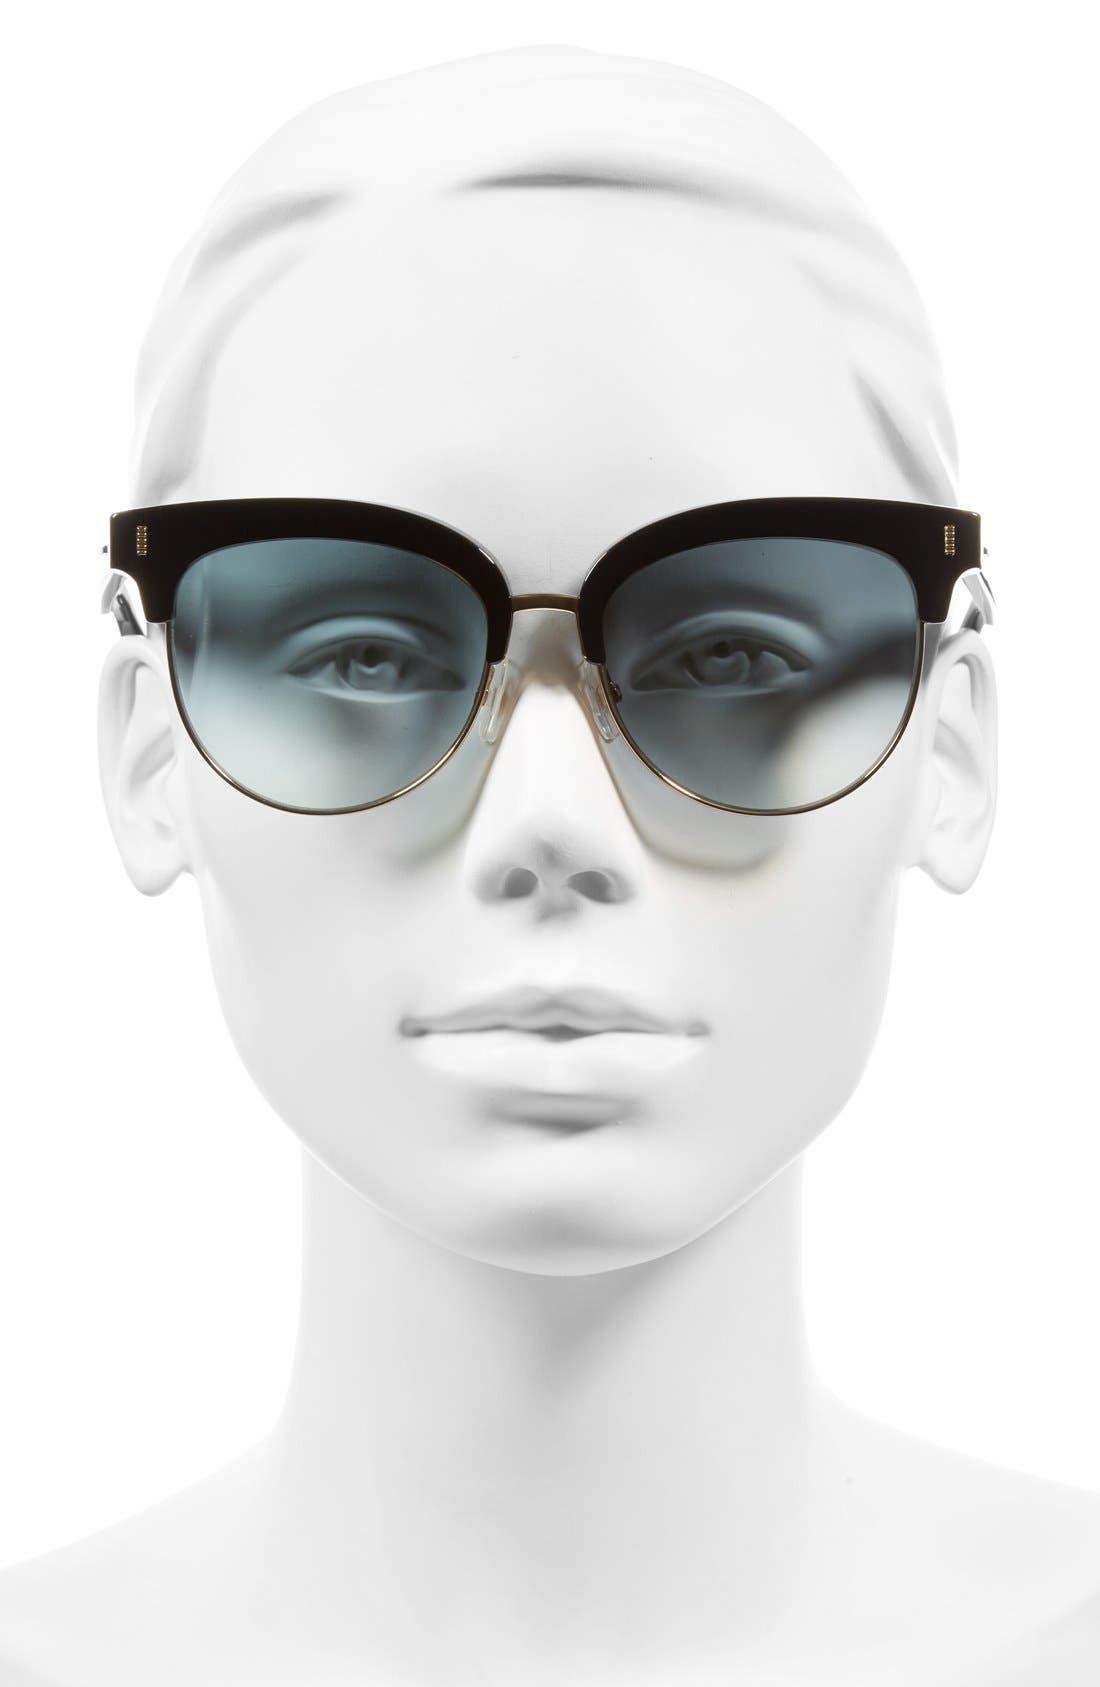 54mm Sunglasses,                             Alternate thumbnail 2, color,                             BLACK